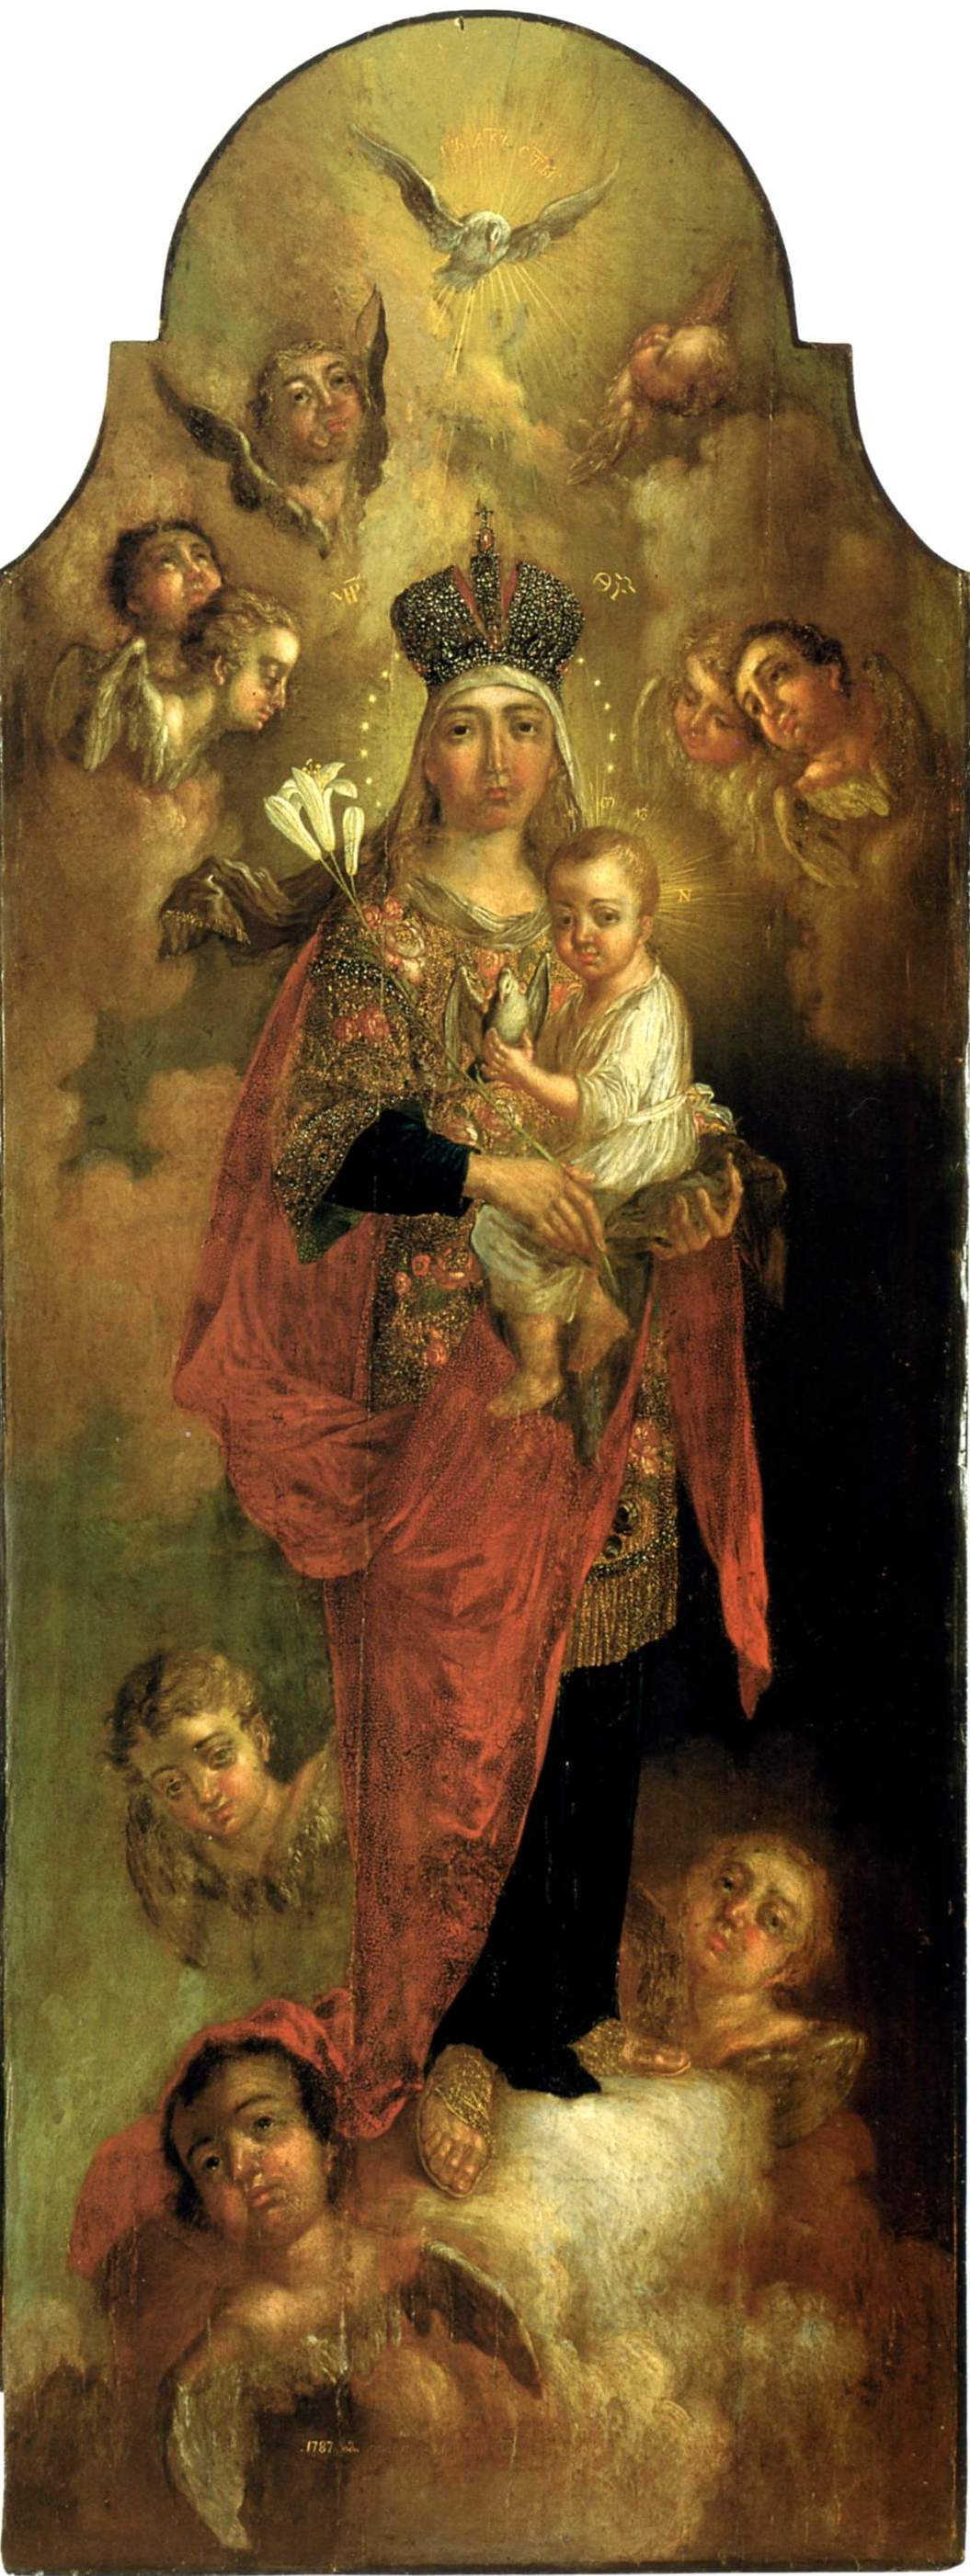 Vladimir Borovikovsky. The virgin and child